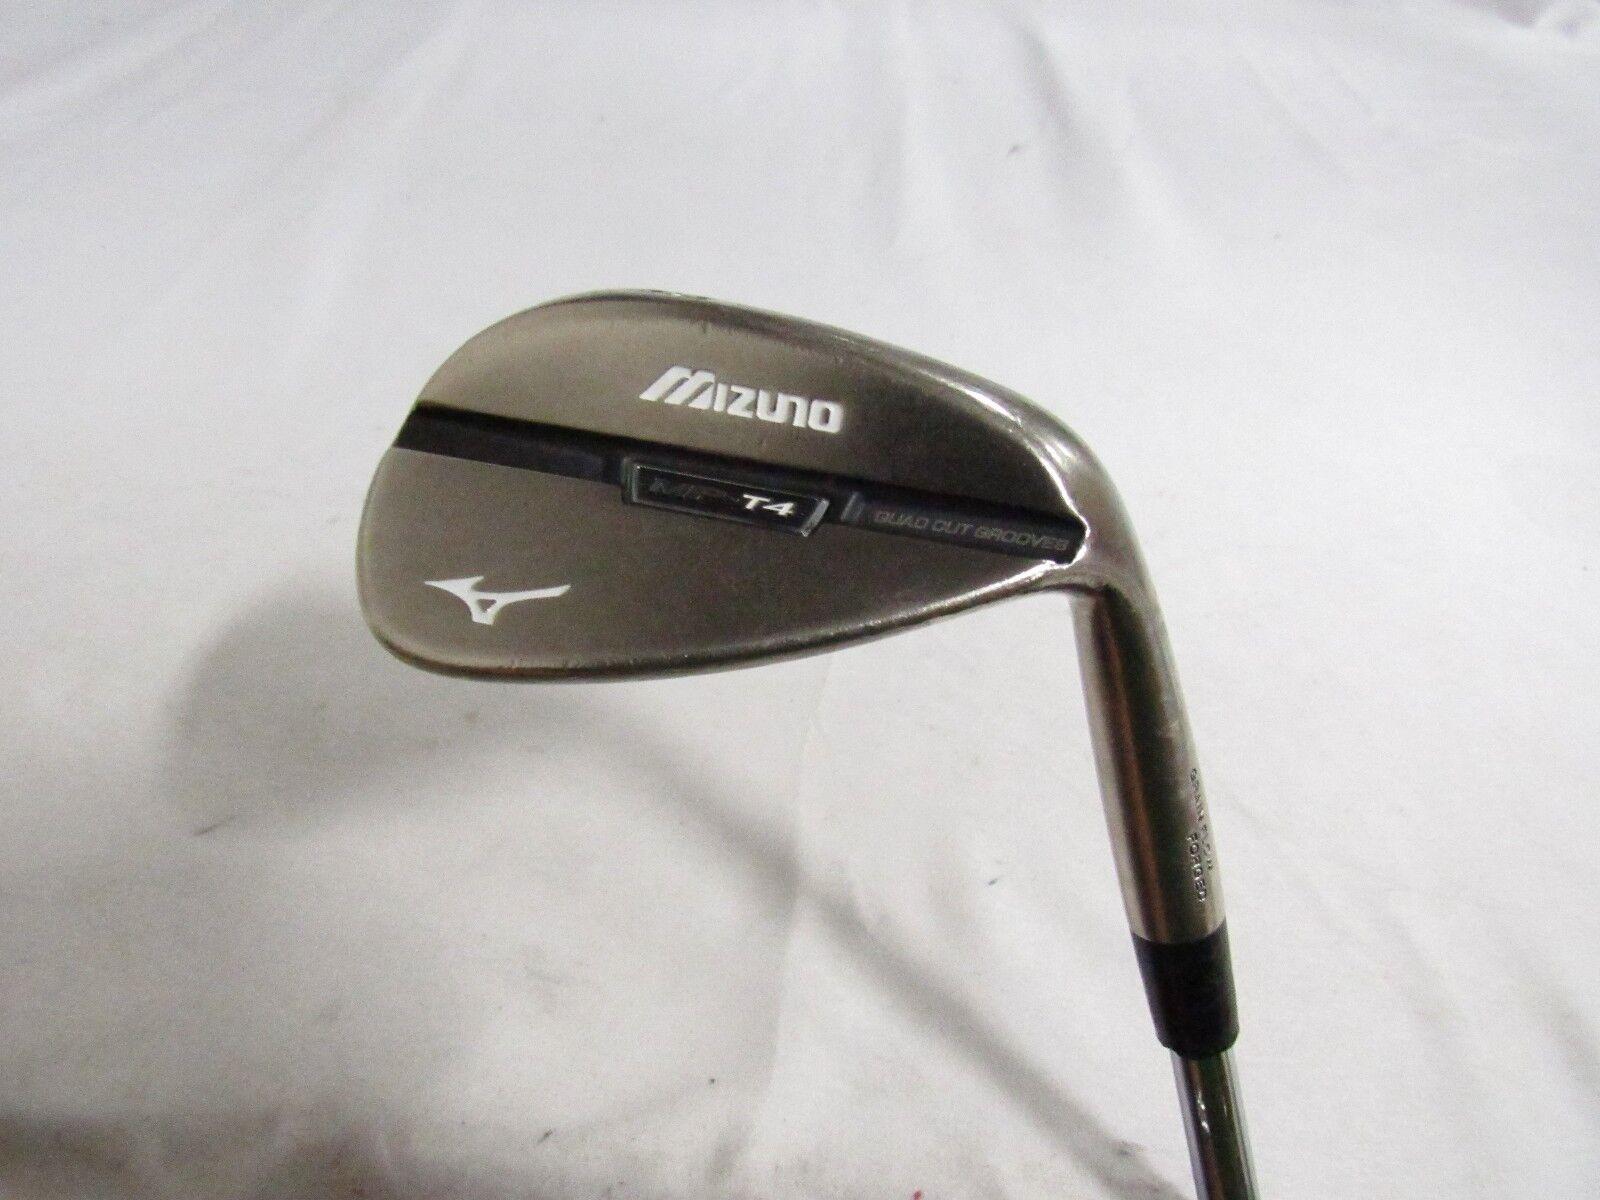 Usado RH Mizuno MP-T4 (Negro) Sand Wedge 56.10  Acero extra Stiff Flex Proj X X